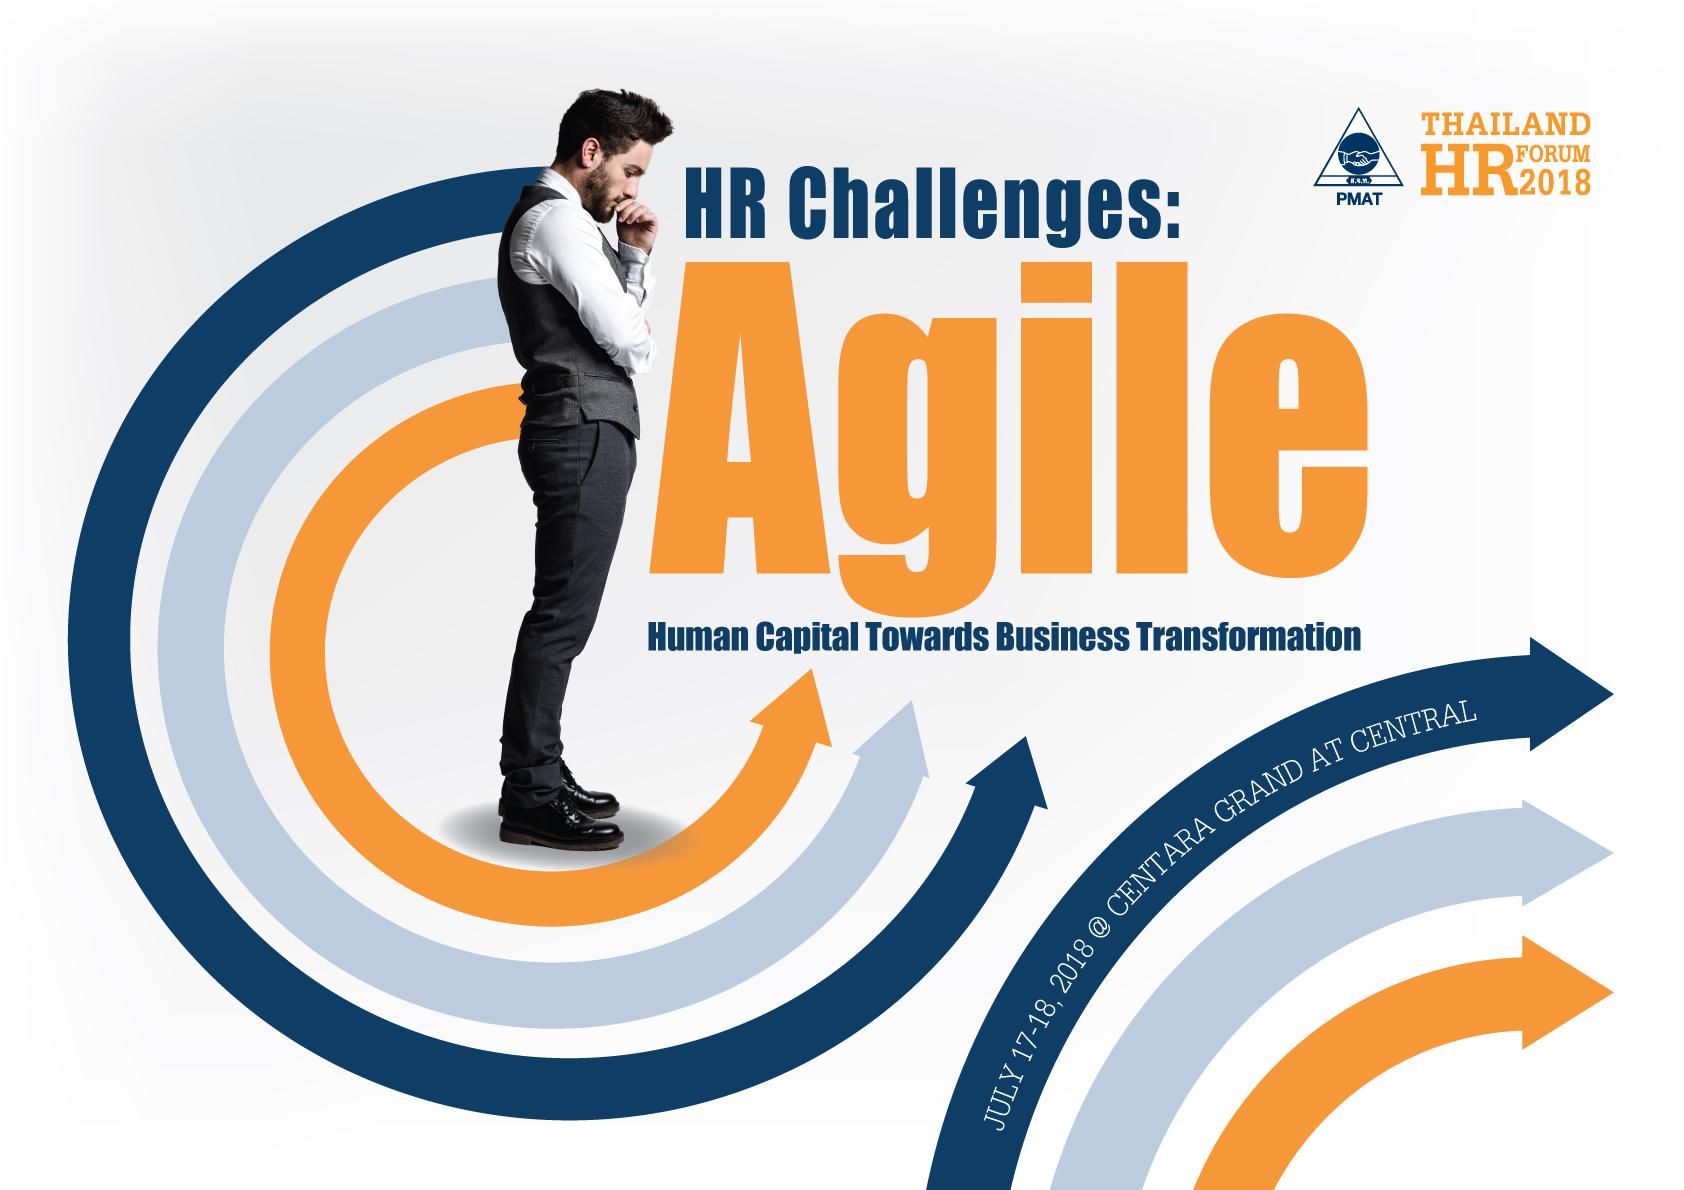 Thailand HR Forum 2018 - HR Challenges: Agile Human Capital Towards Business Transformation